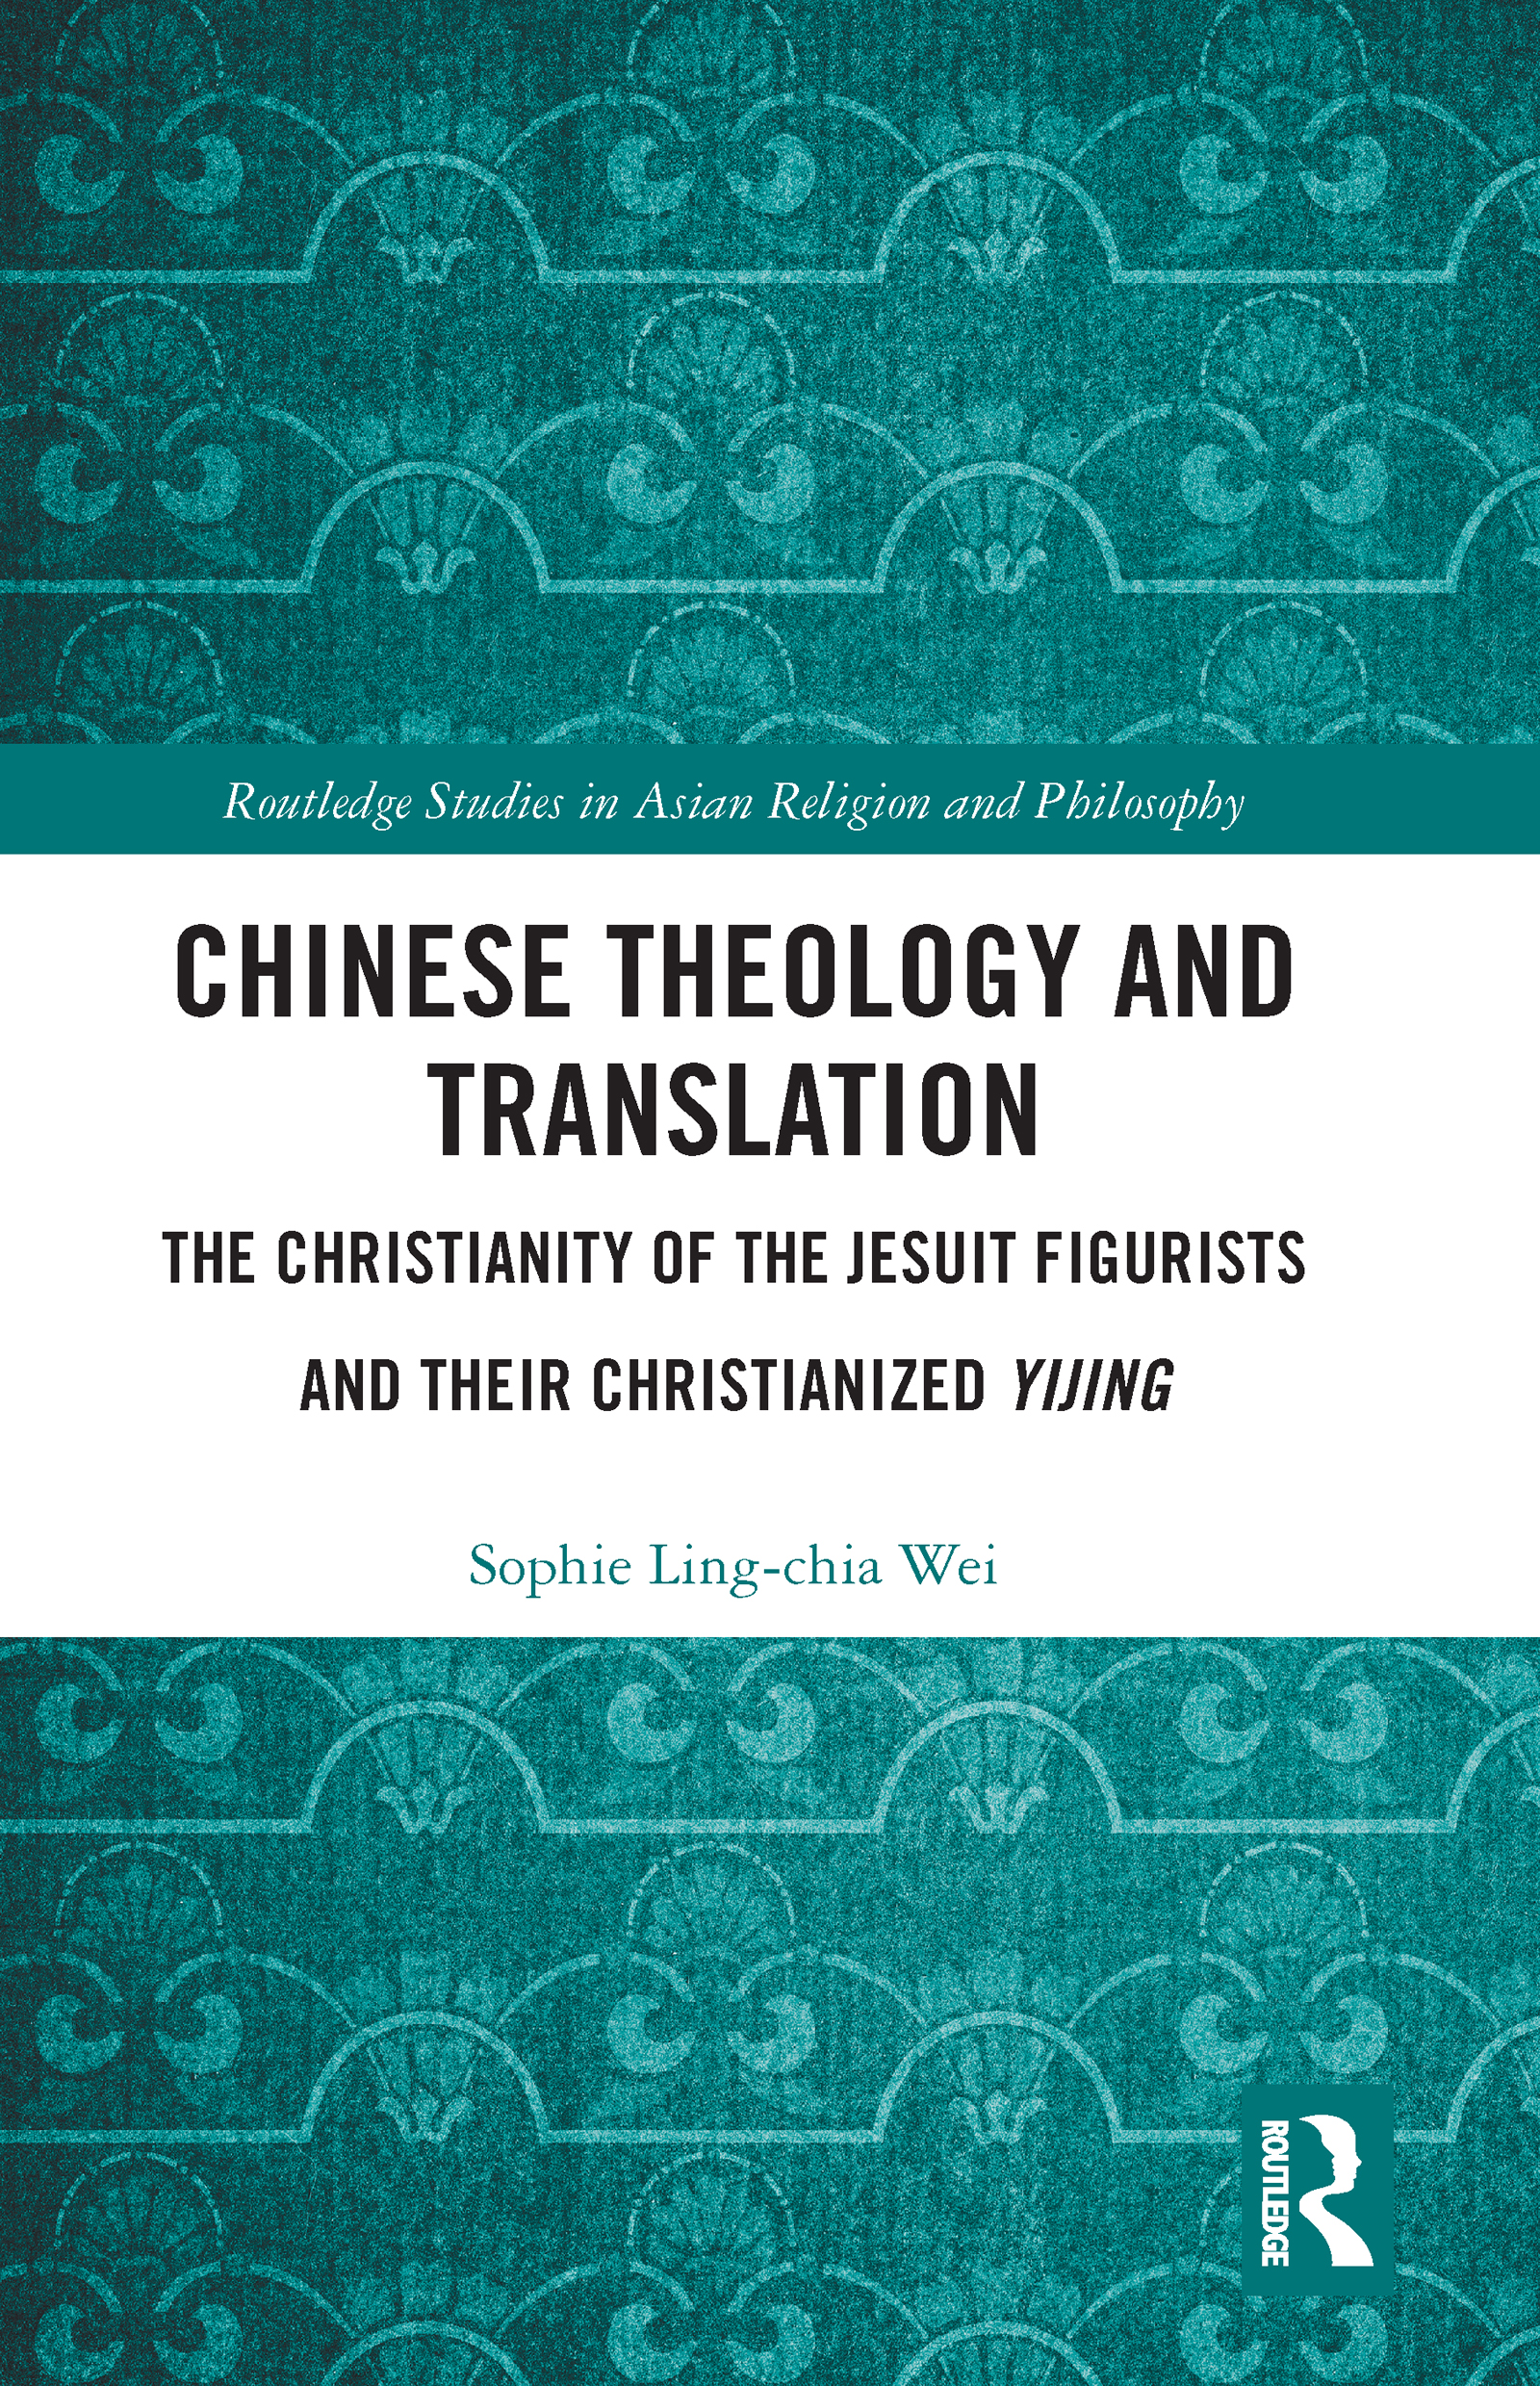 Chinese Theology and Translation